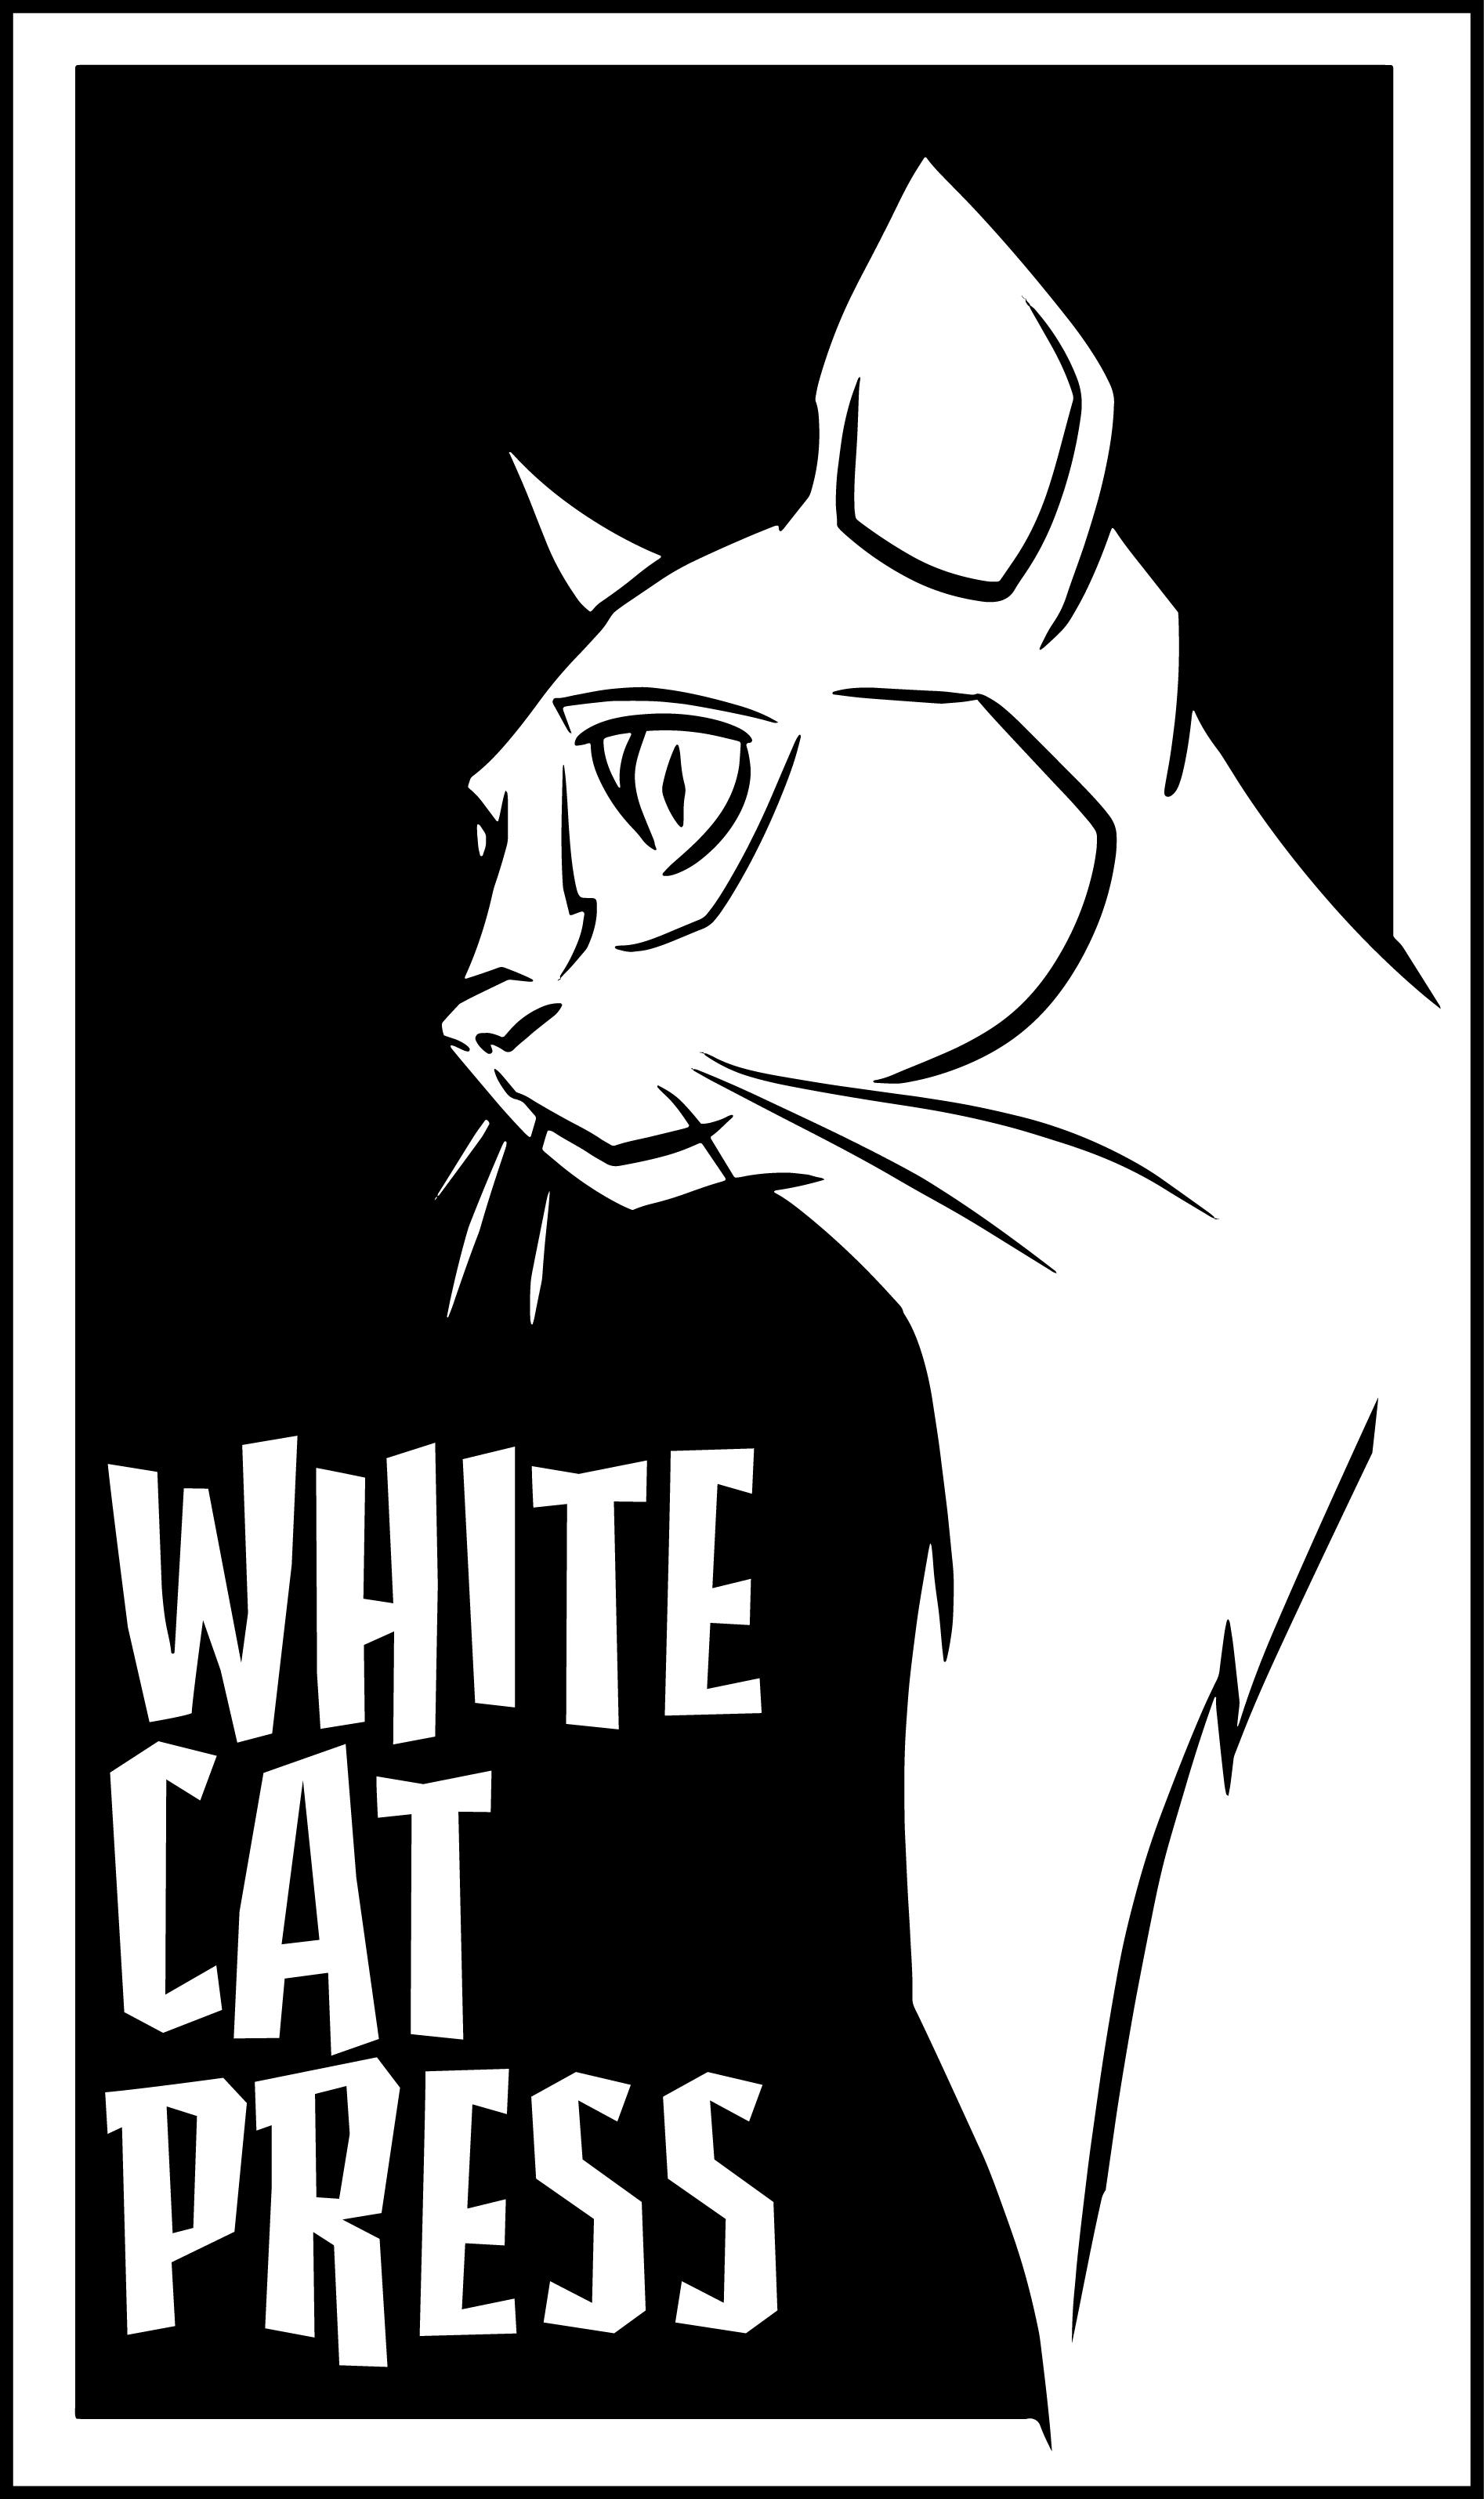 cat logo words.jpg